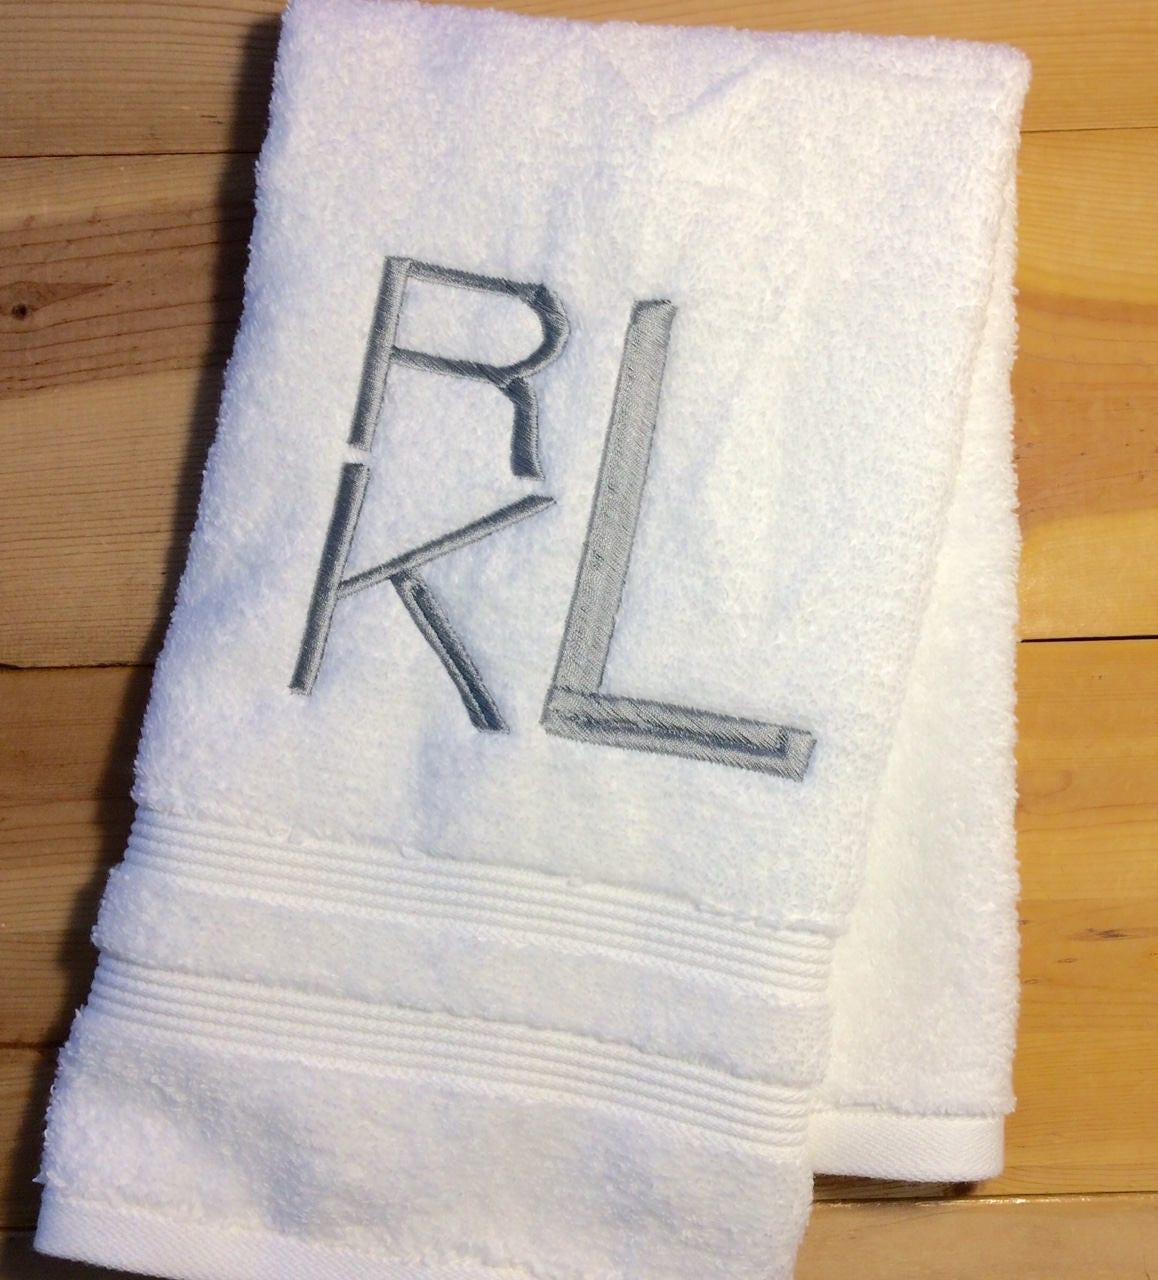 Monogrammed Towels, Circle Script Monogram Embroidered Hand Towel or  Fingertip Towel, Personalized Towels,